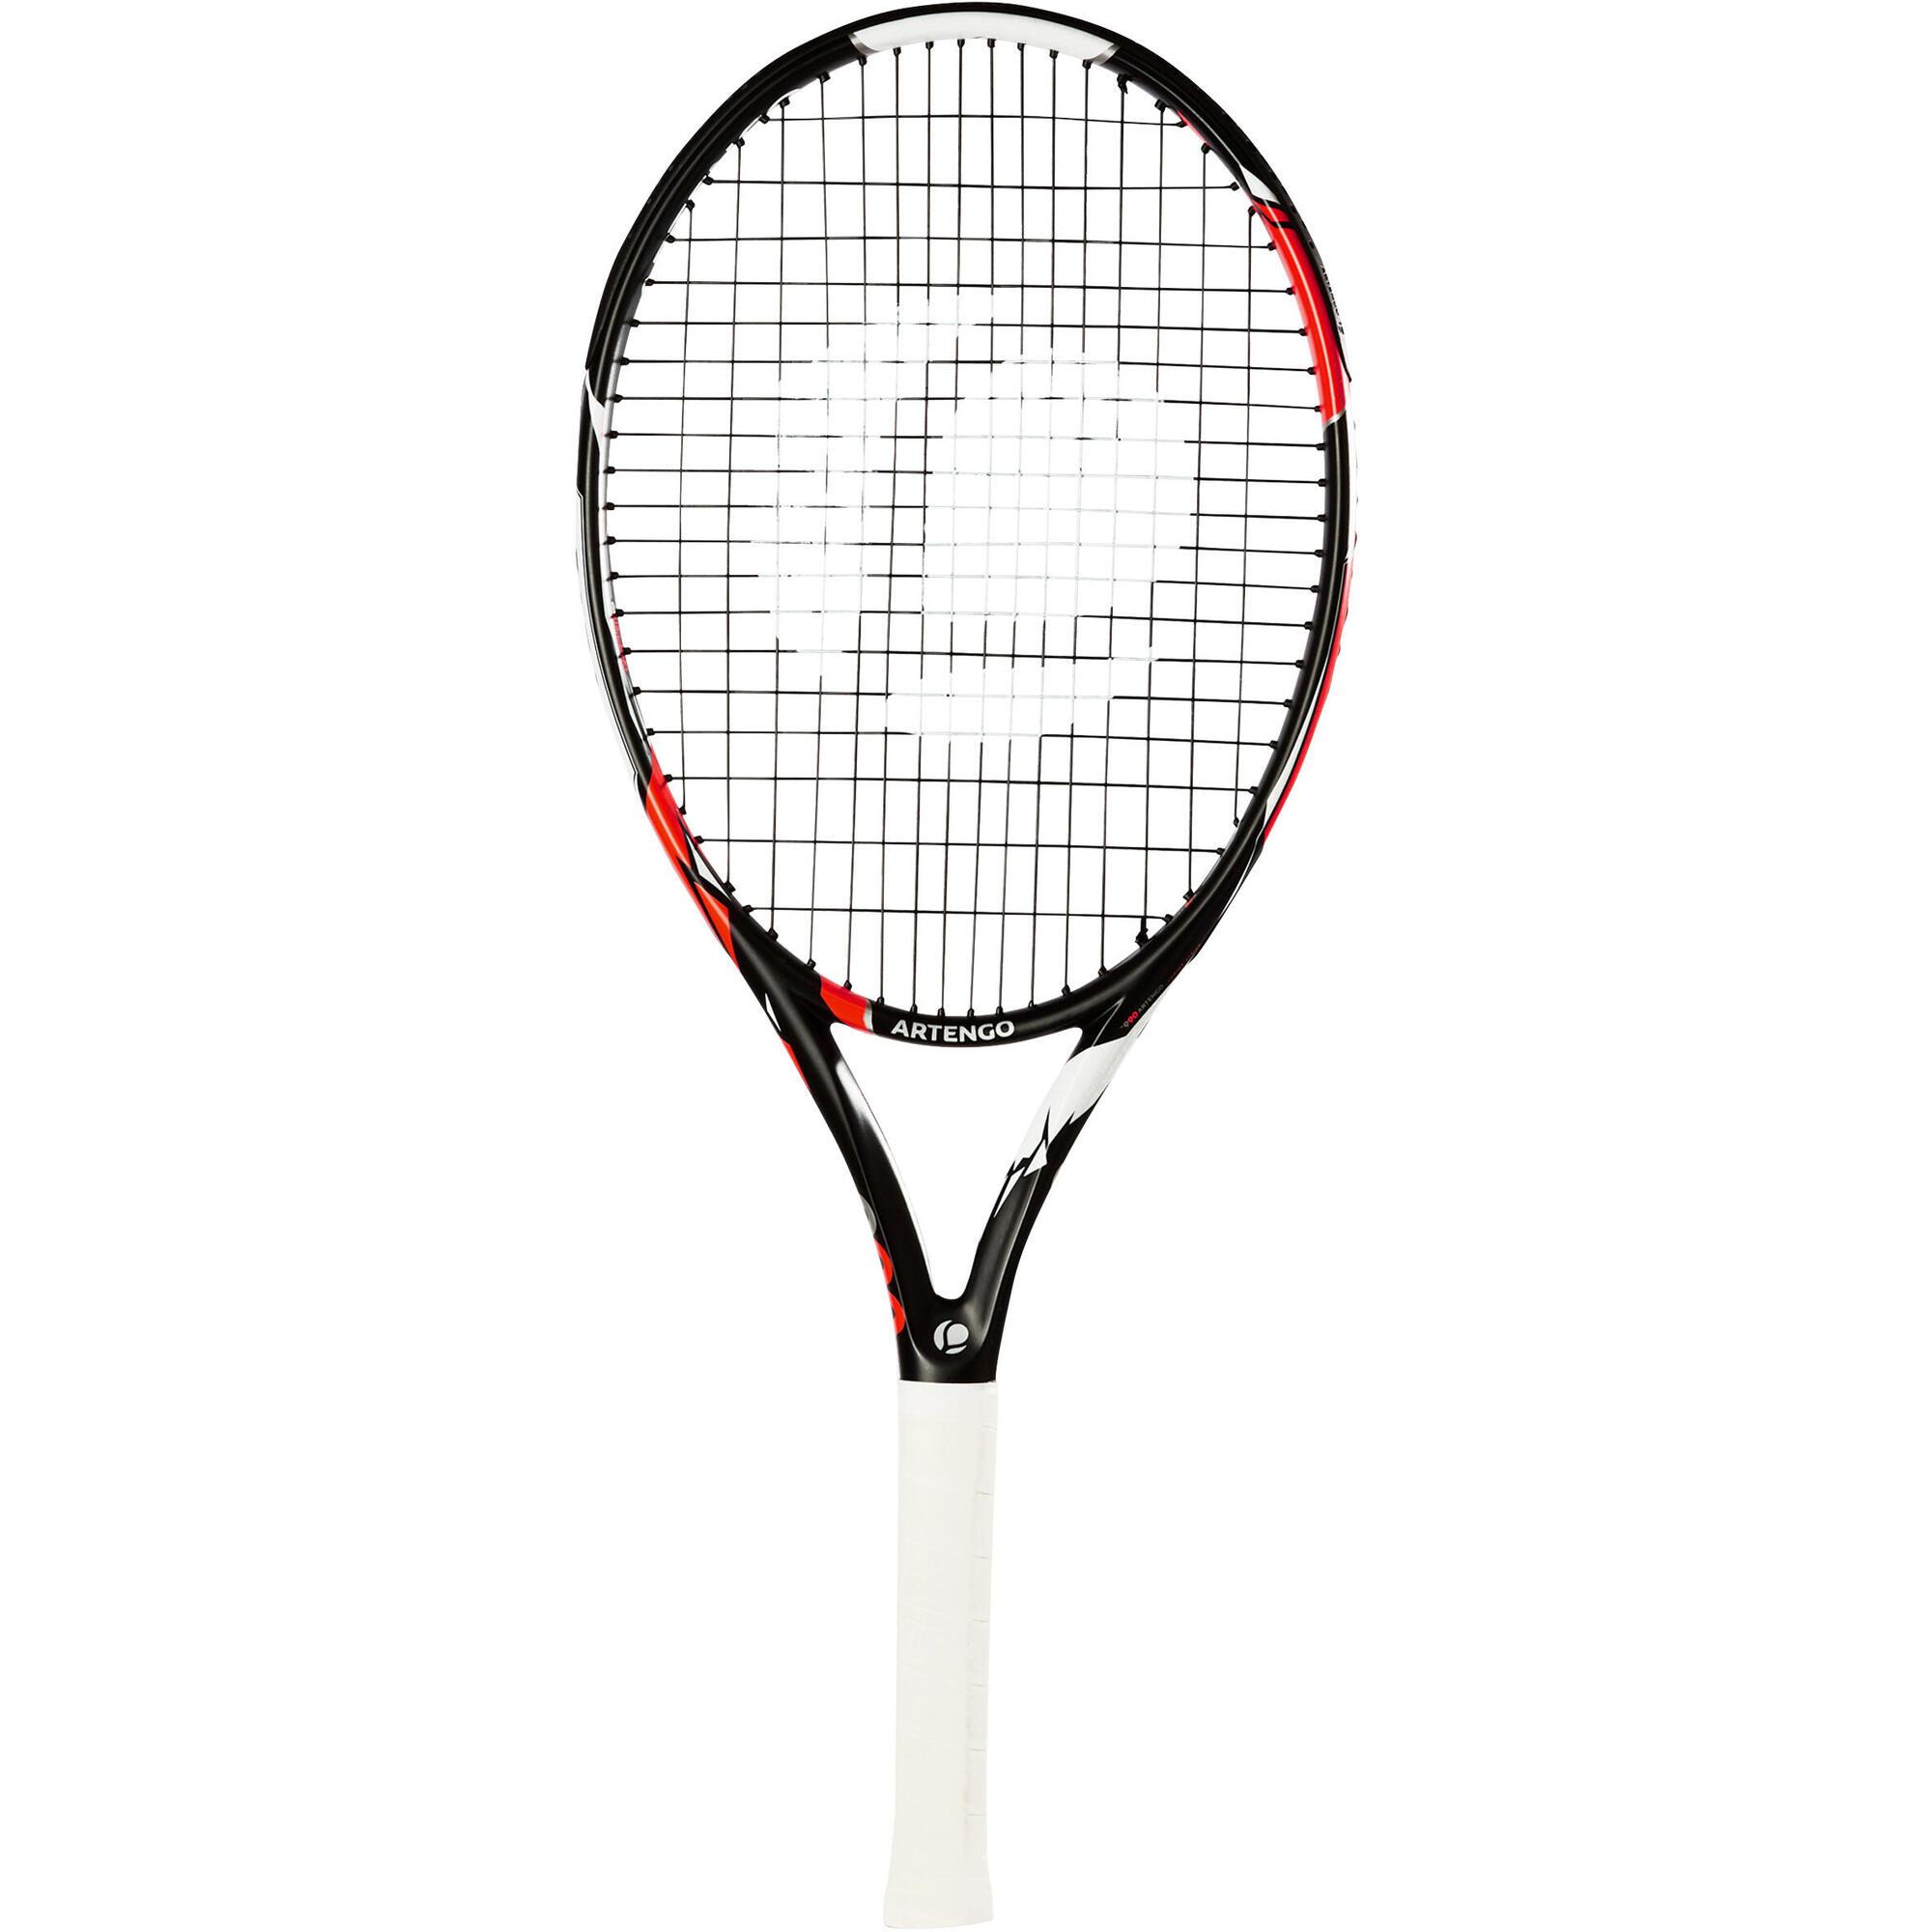 Raquette de tennis enfant tr990 26 noir orange artengo - Raquette de tennis de table decathlon ...